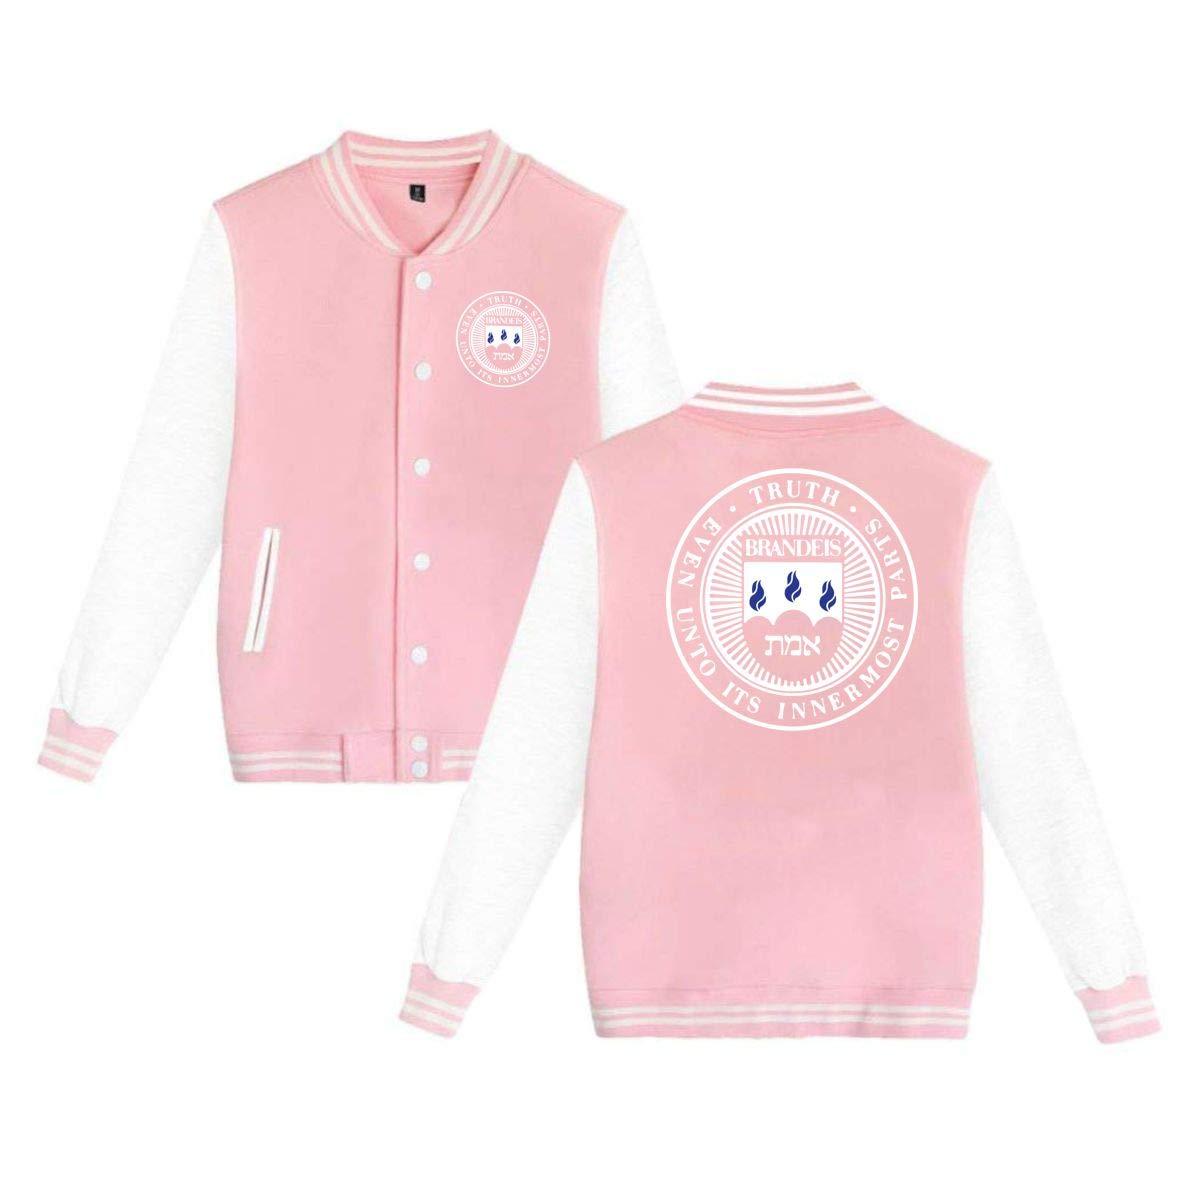 QTHOO Unisex Brandeis University Long Sleeve Velvet Warm Casual Baseball Uniform Jacket Button Sport Coat